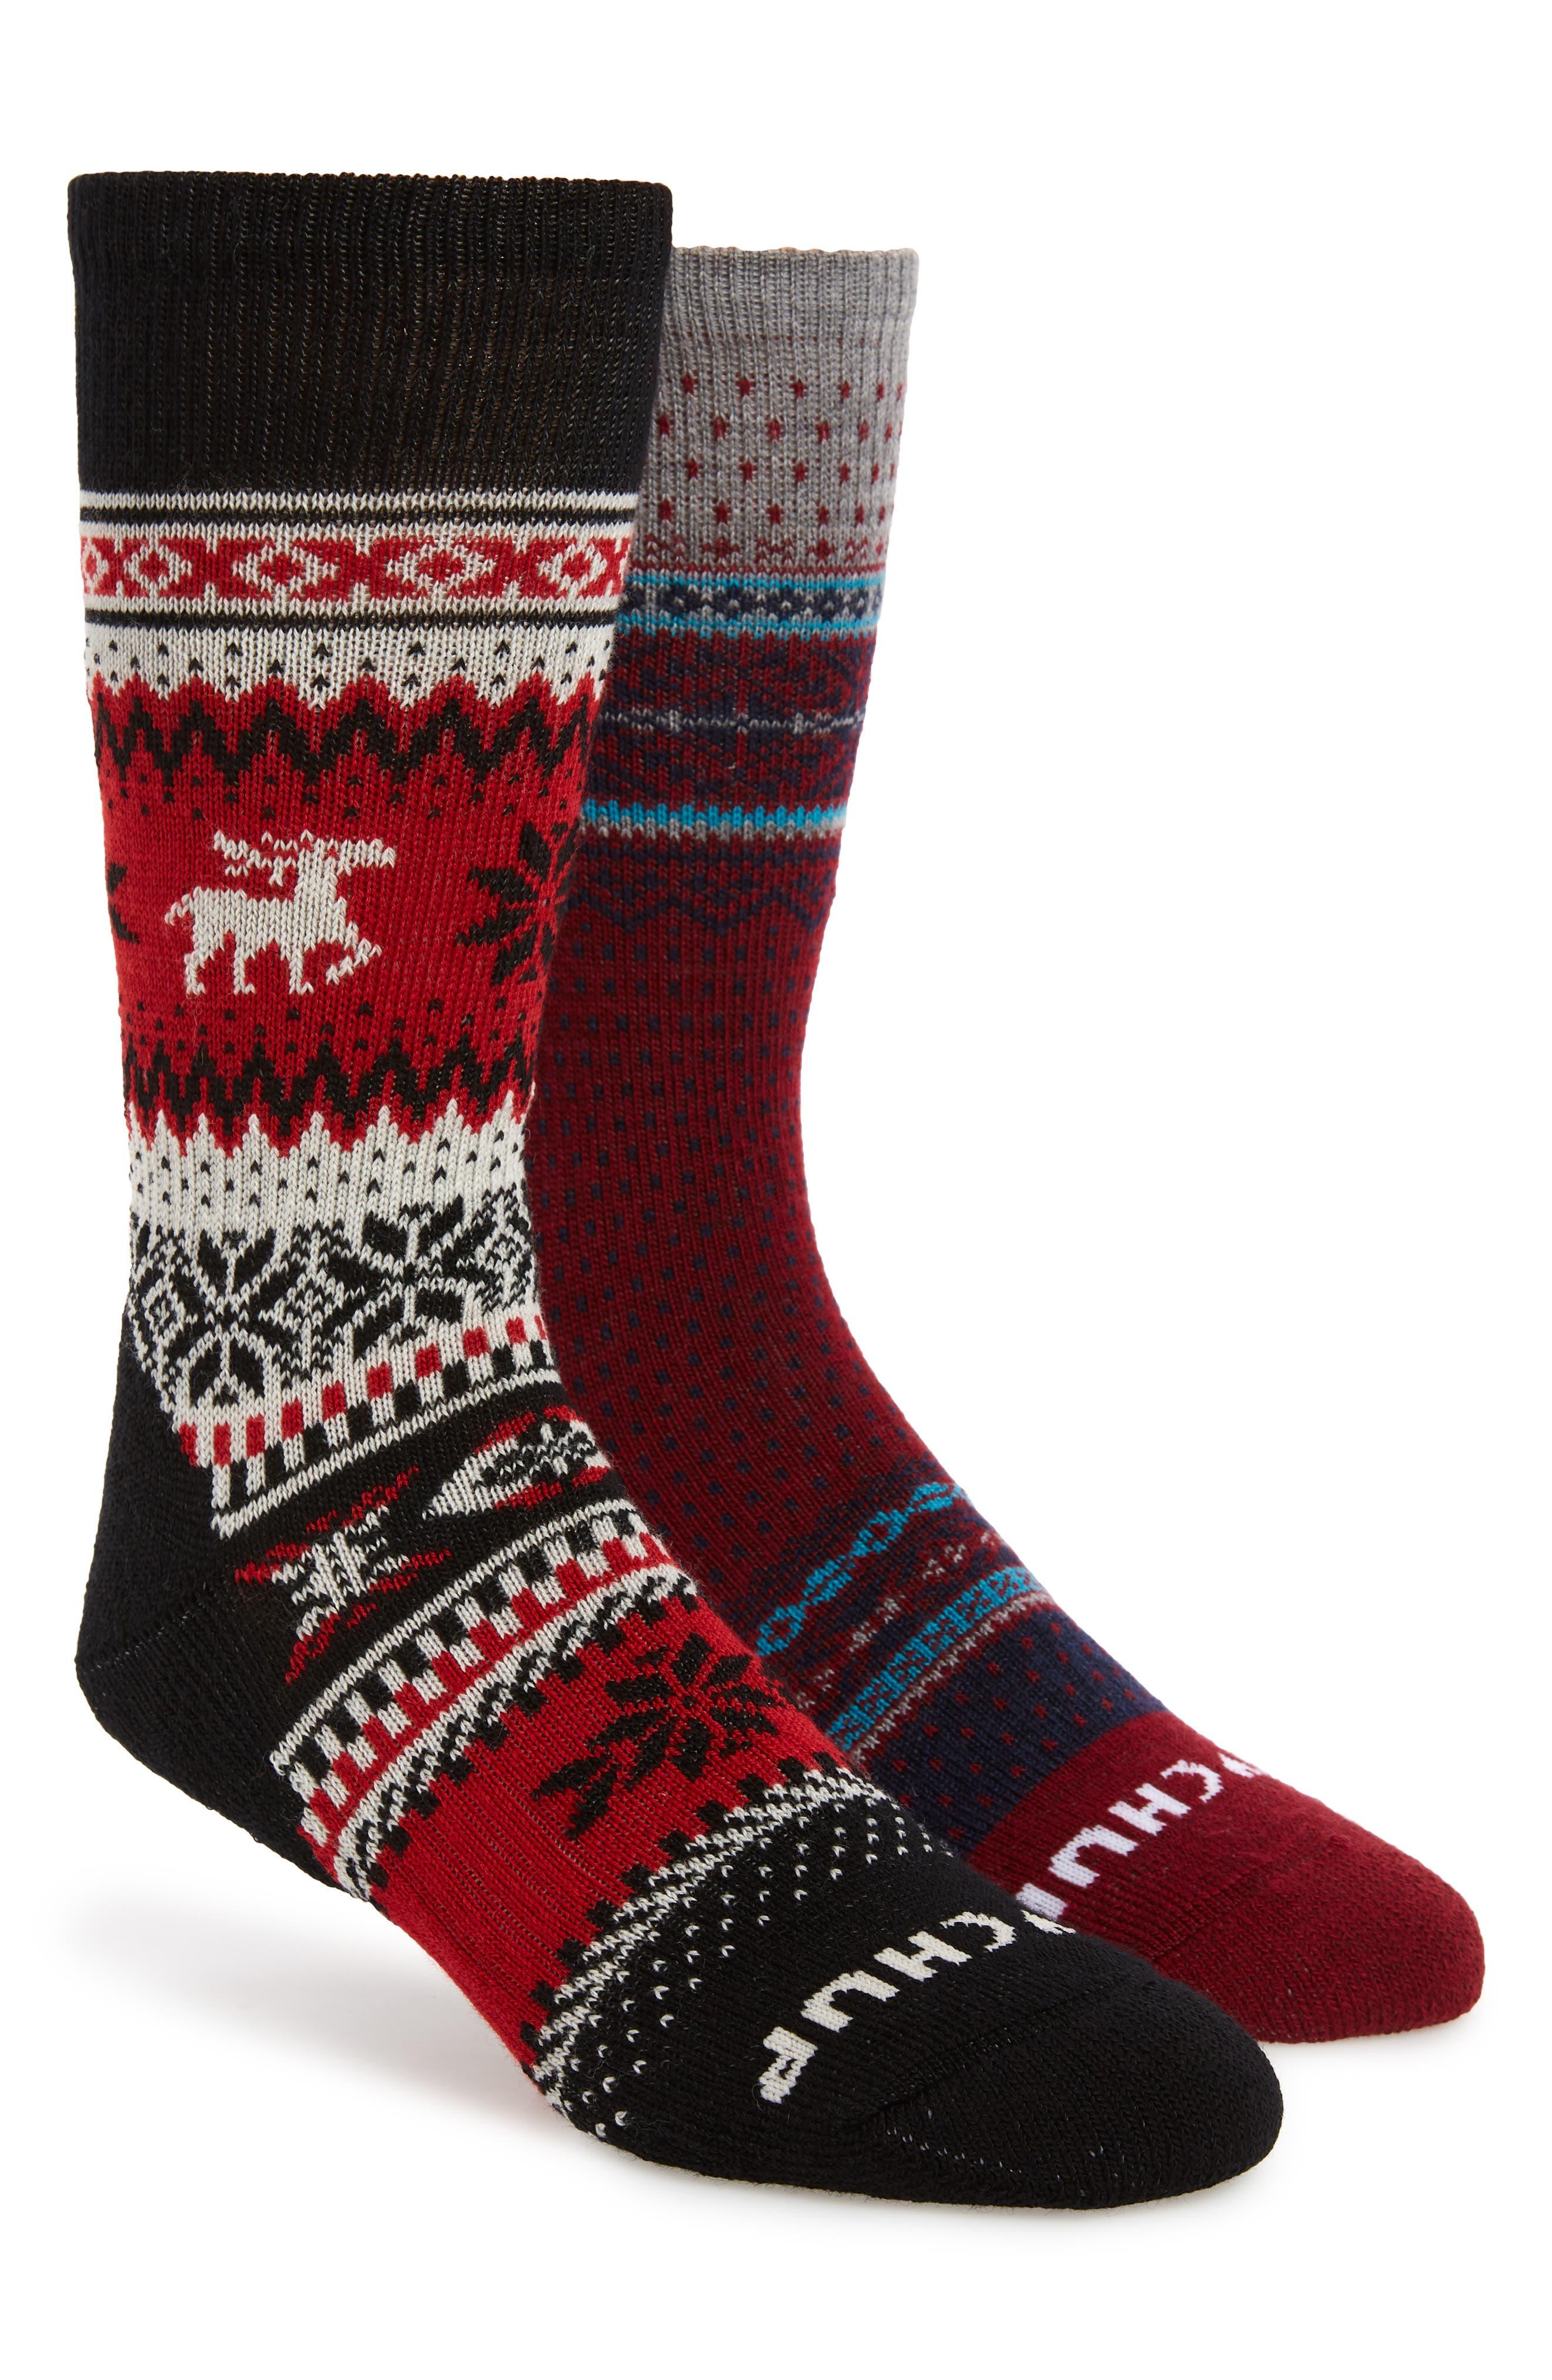 x CHUP 2-Pack Socks,                             Main thumbnail 1, color,                             BLACK/ TIBETAN RED